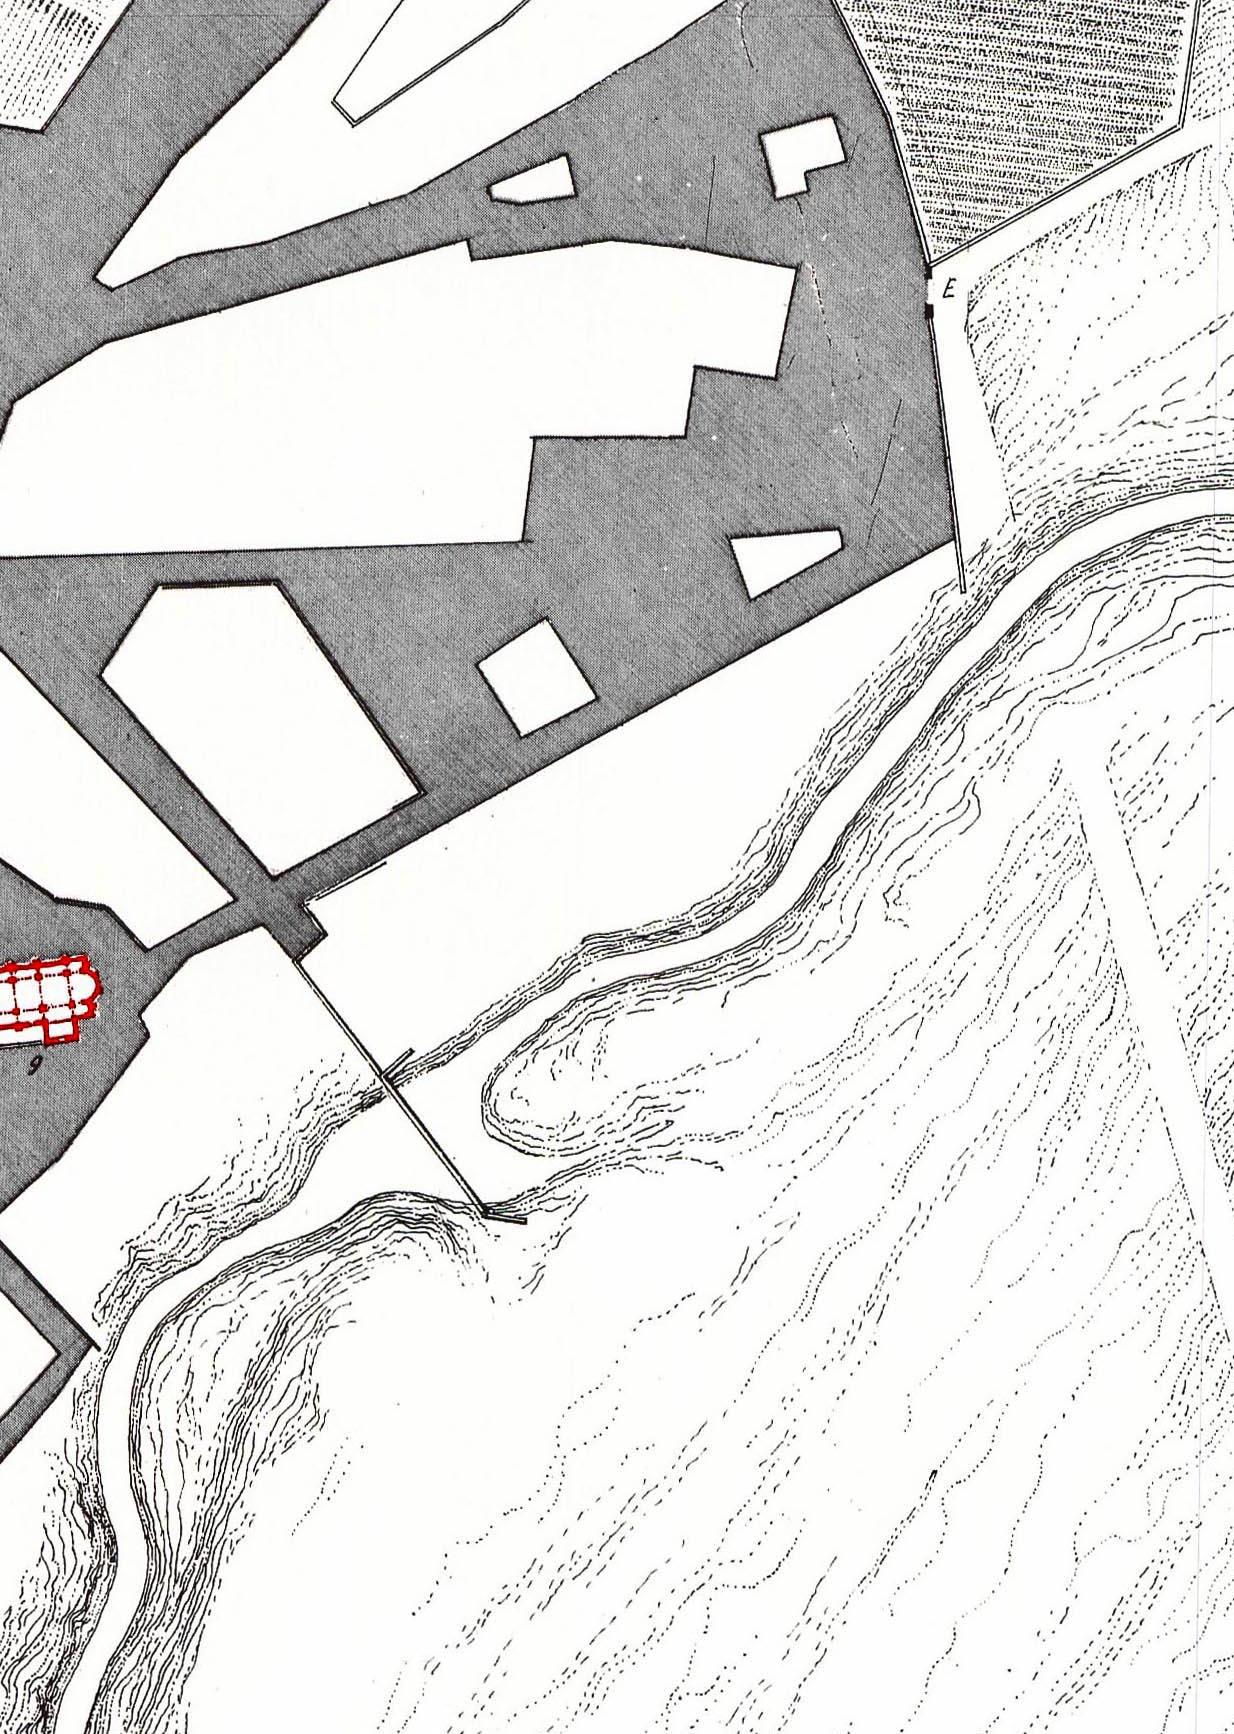 danielvillalobos-valladolid-blueprints-renaissance-f.8